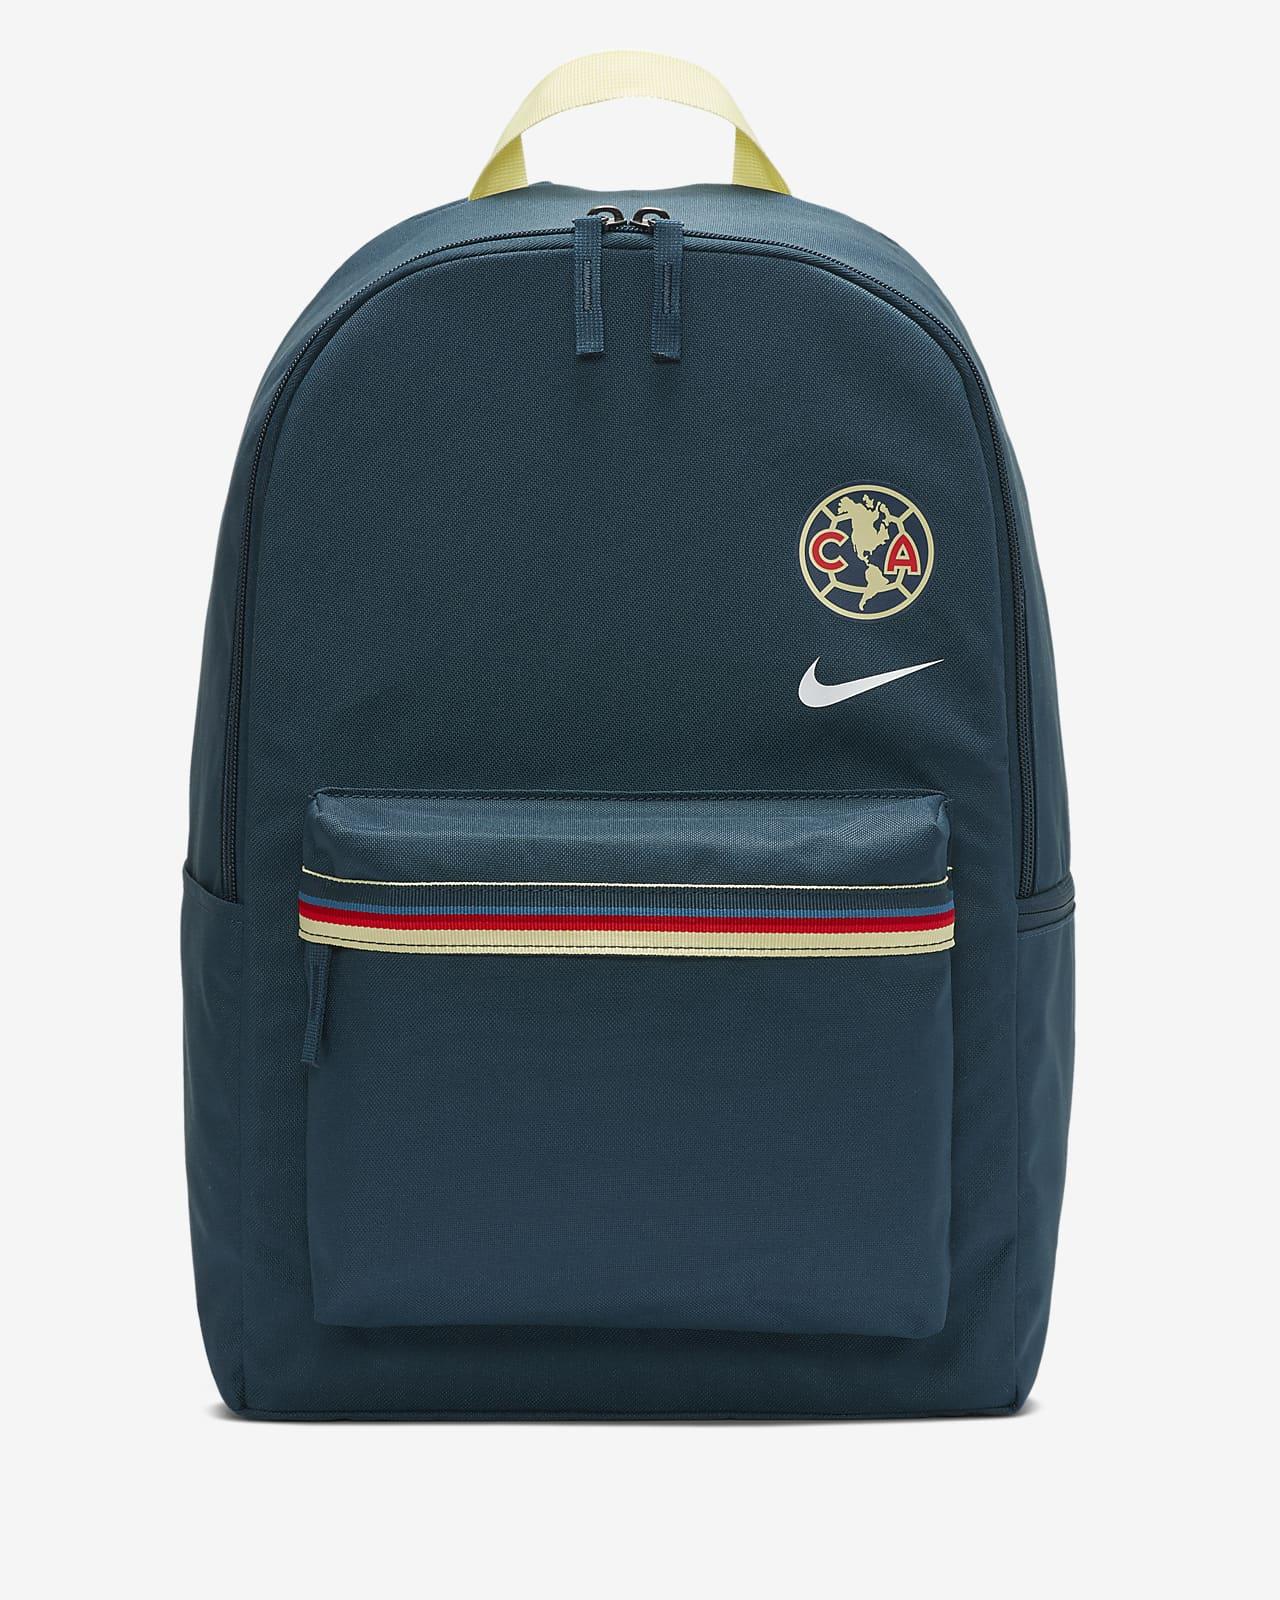 Club América Stadium Soccer Backpack